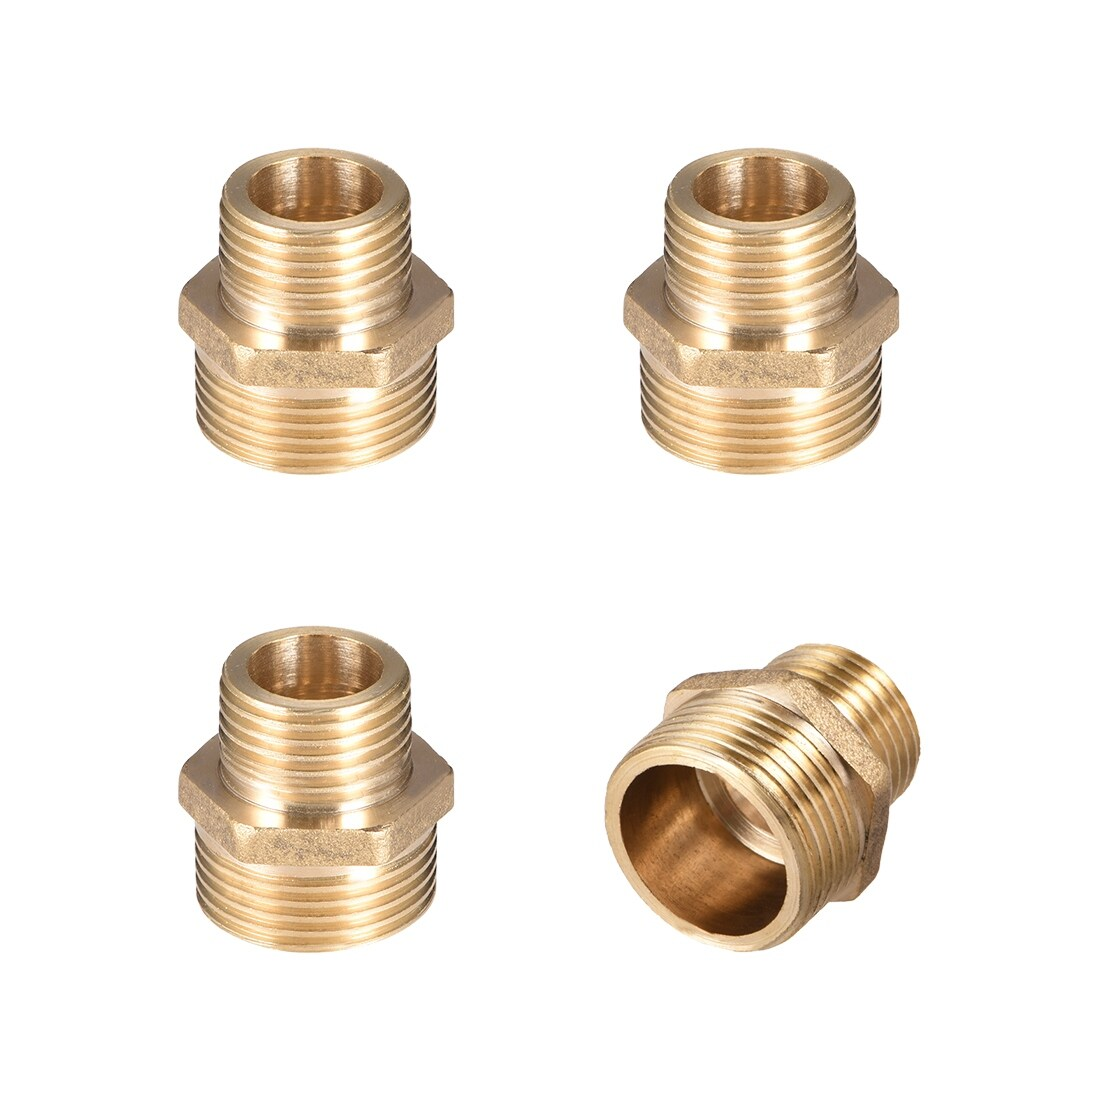 8x Y-Piece 6 mm Pneumatic Brass Socket Nipple